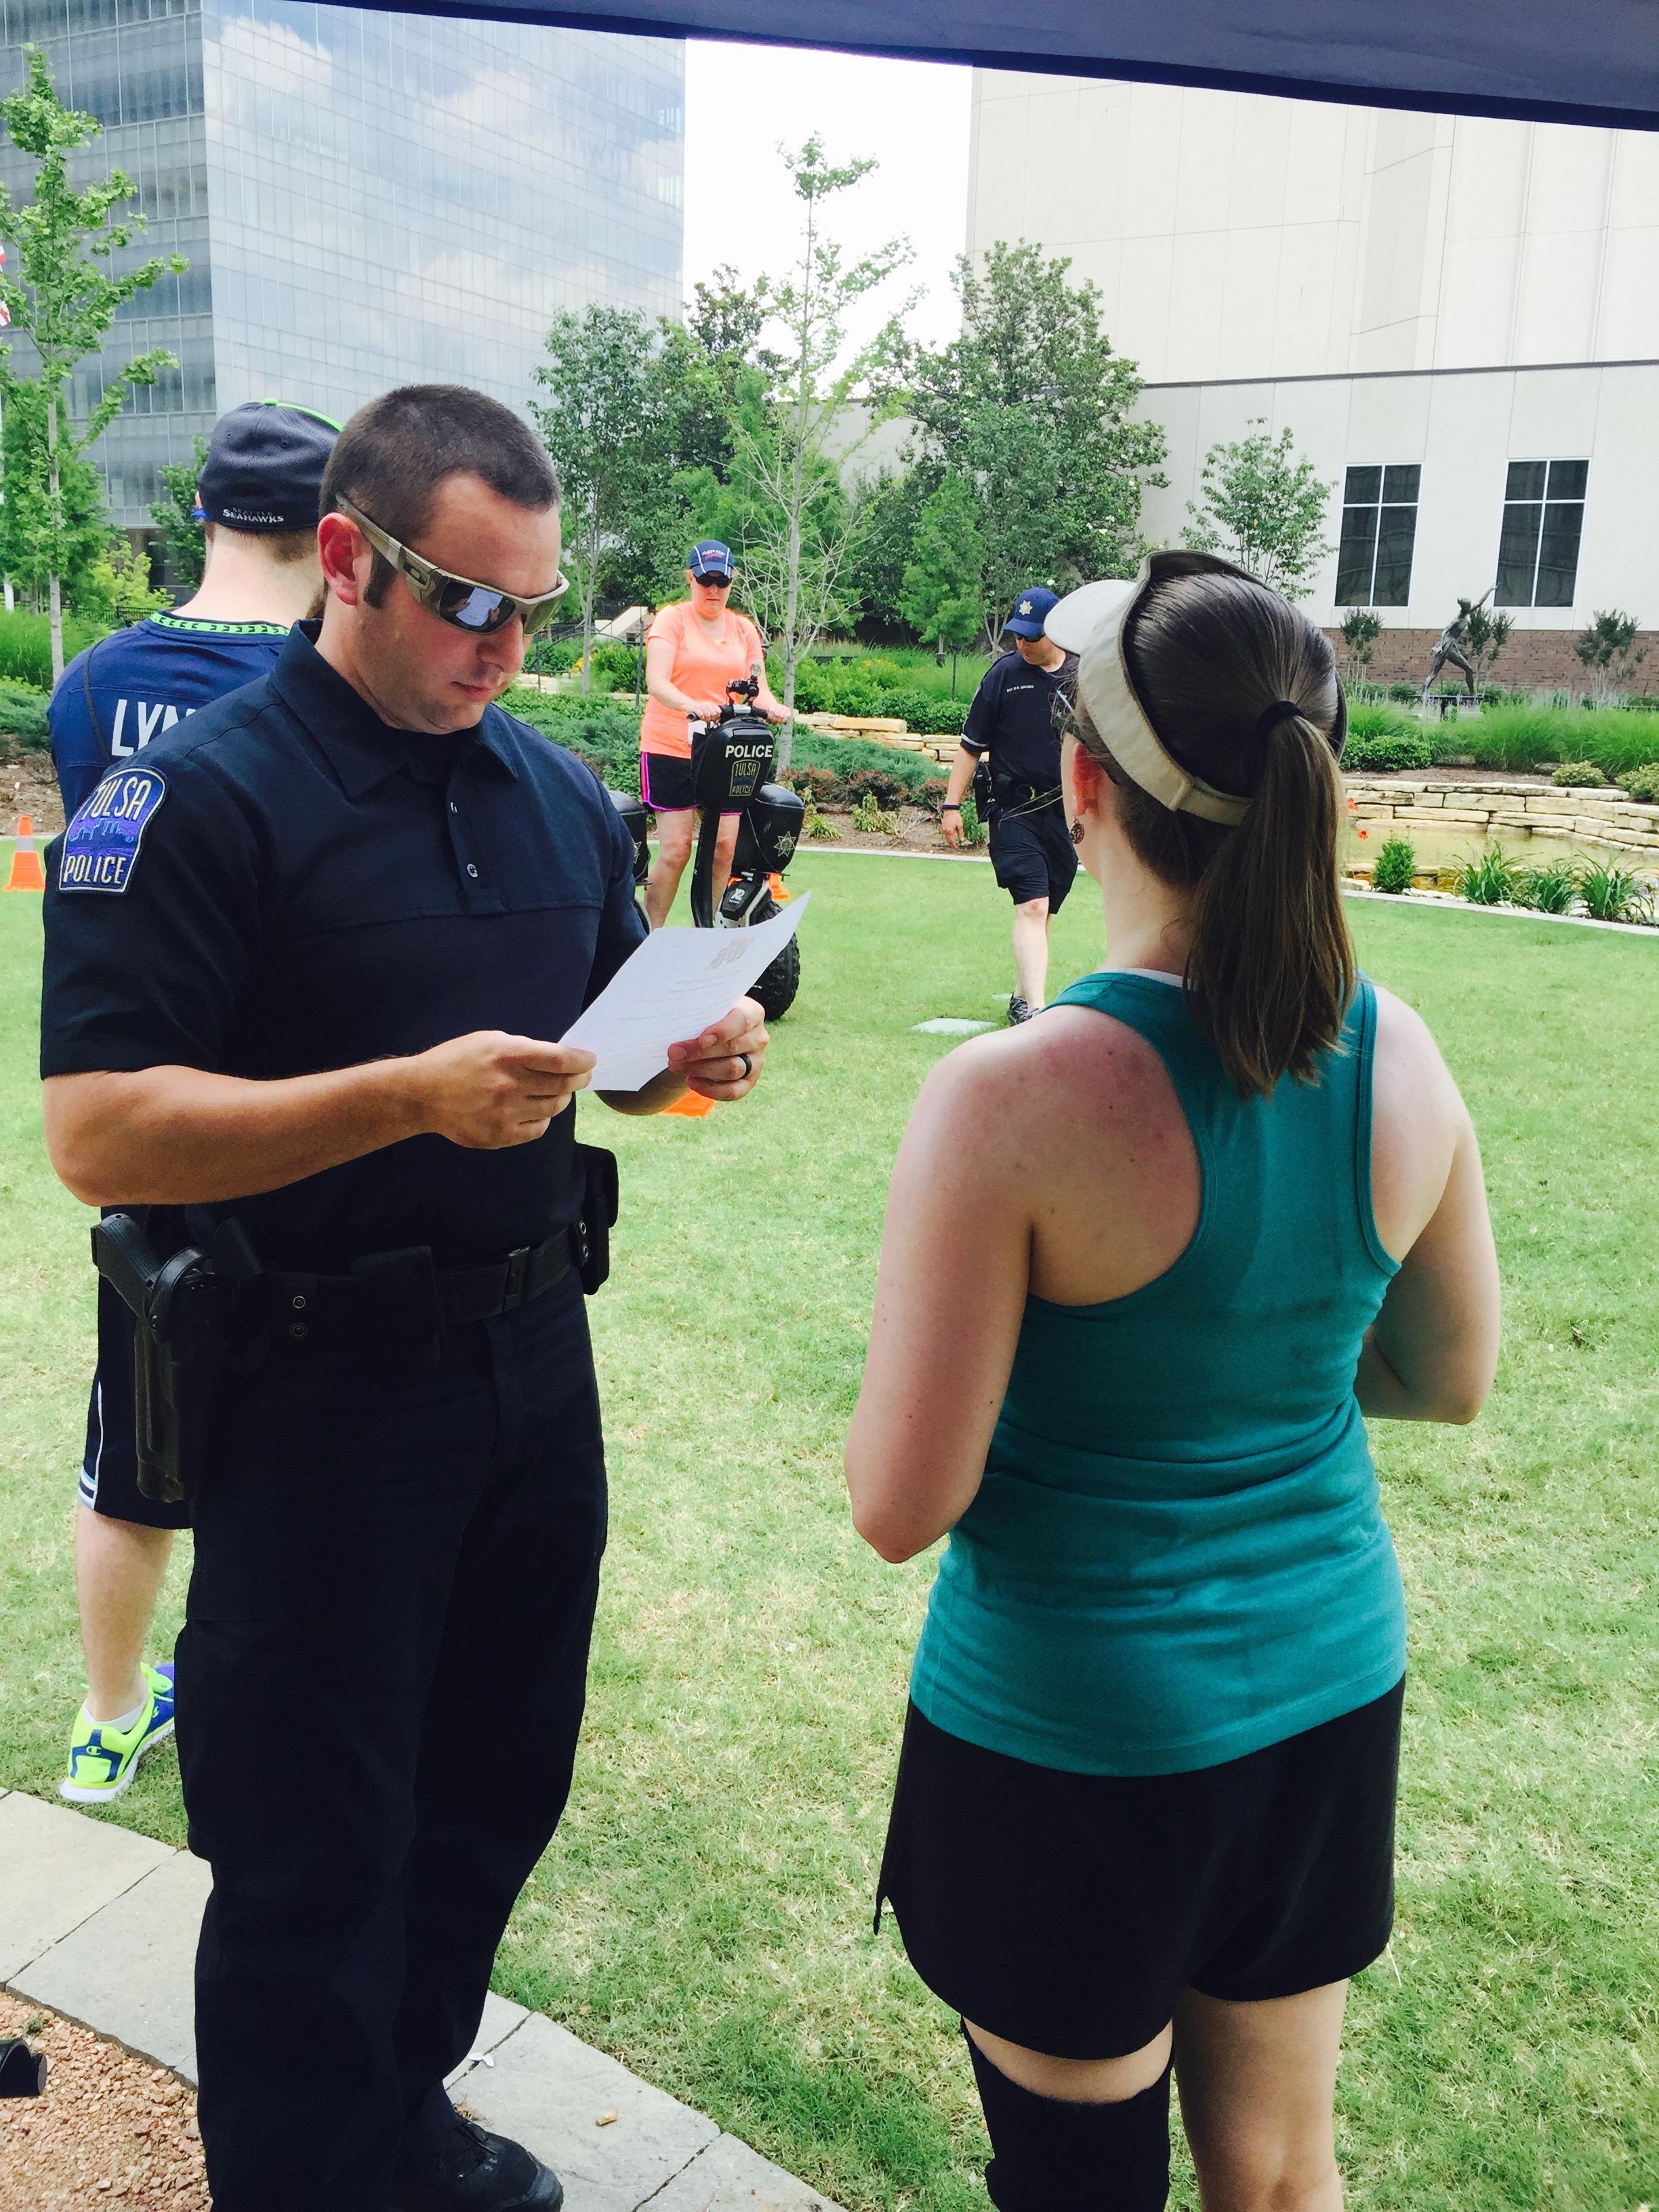 Ashley Reciting Miranda Rights to Police Officer